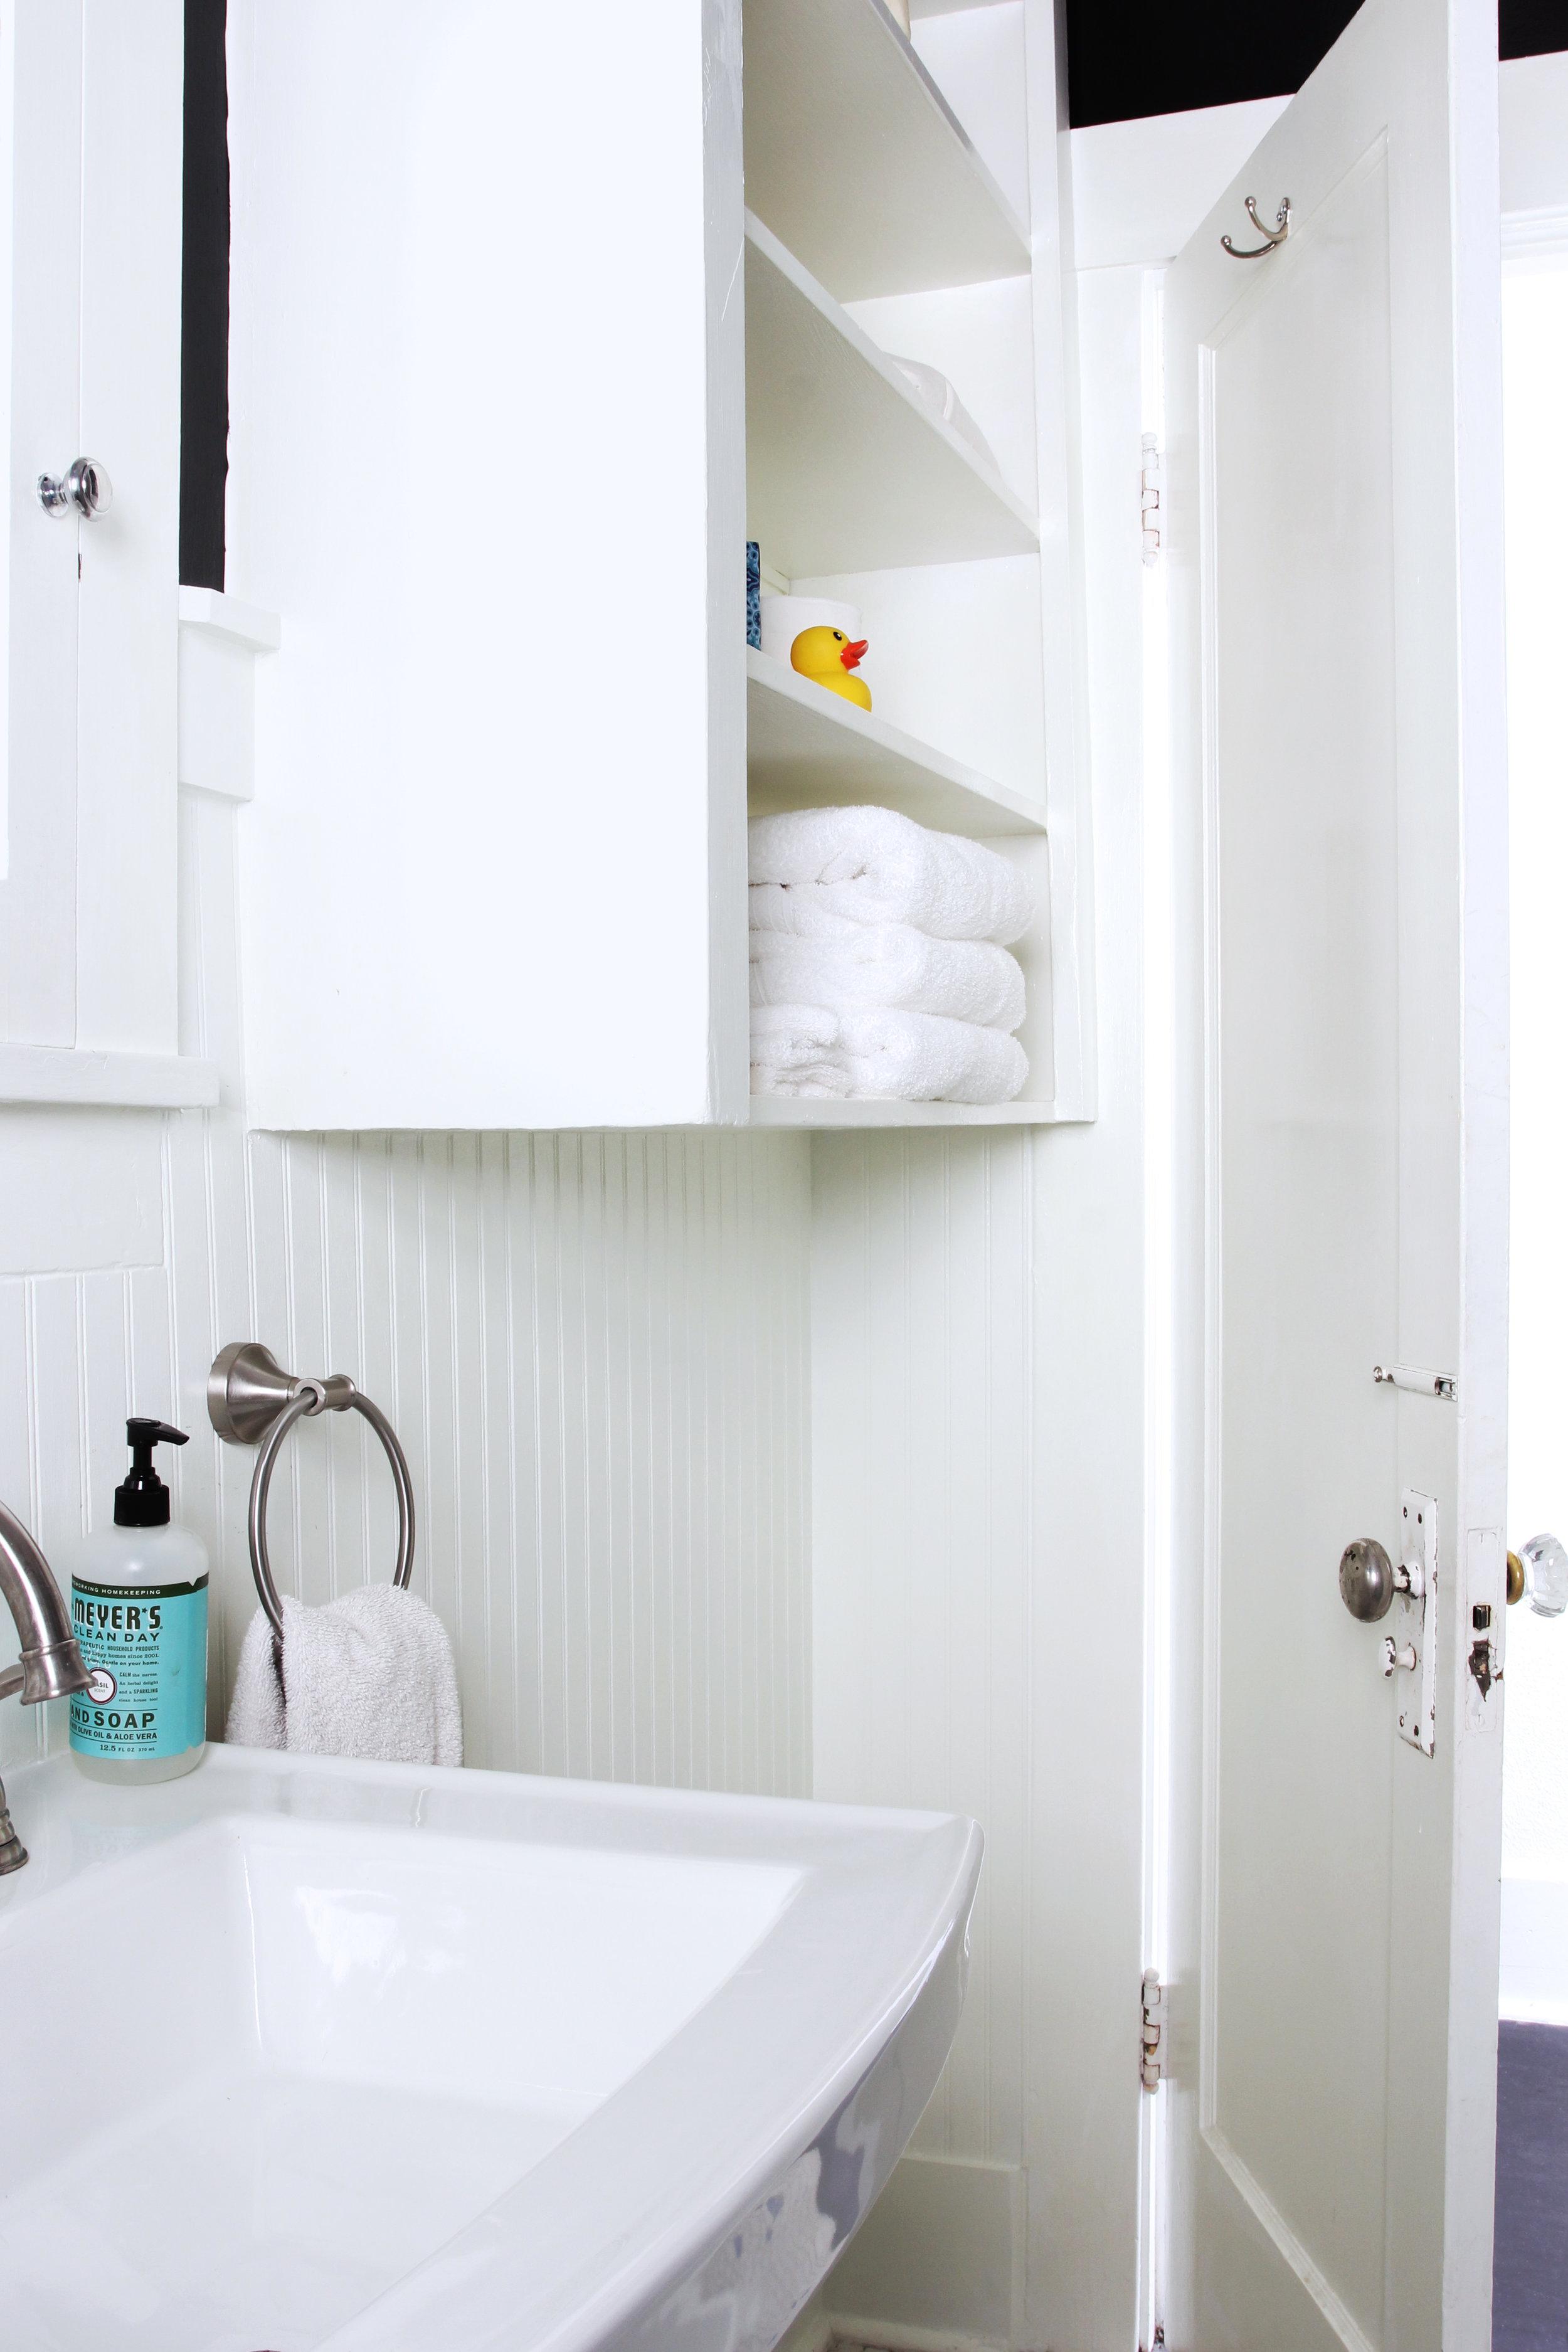 A Bathroom Remodel For Under 1000 At